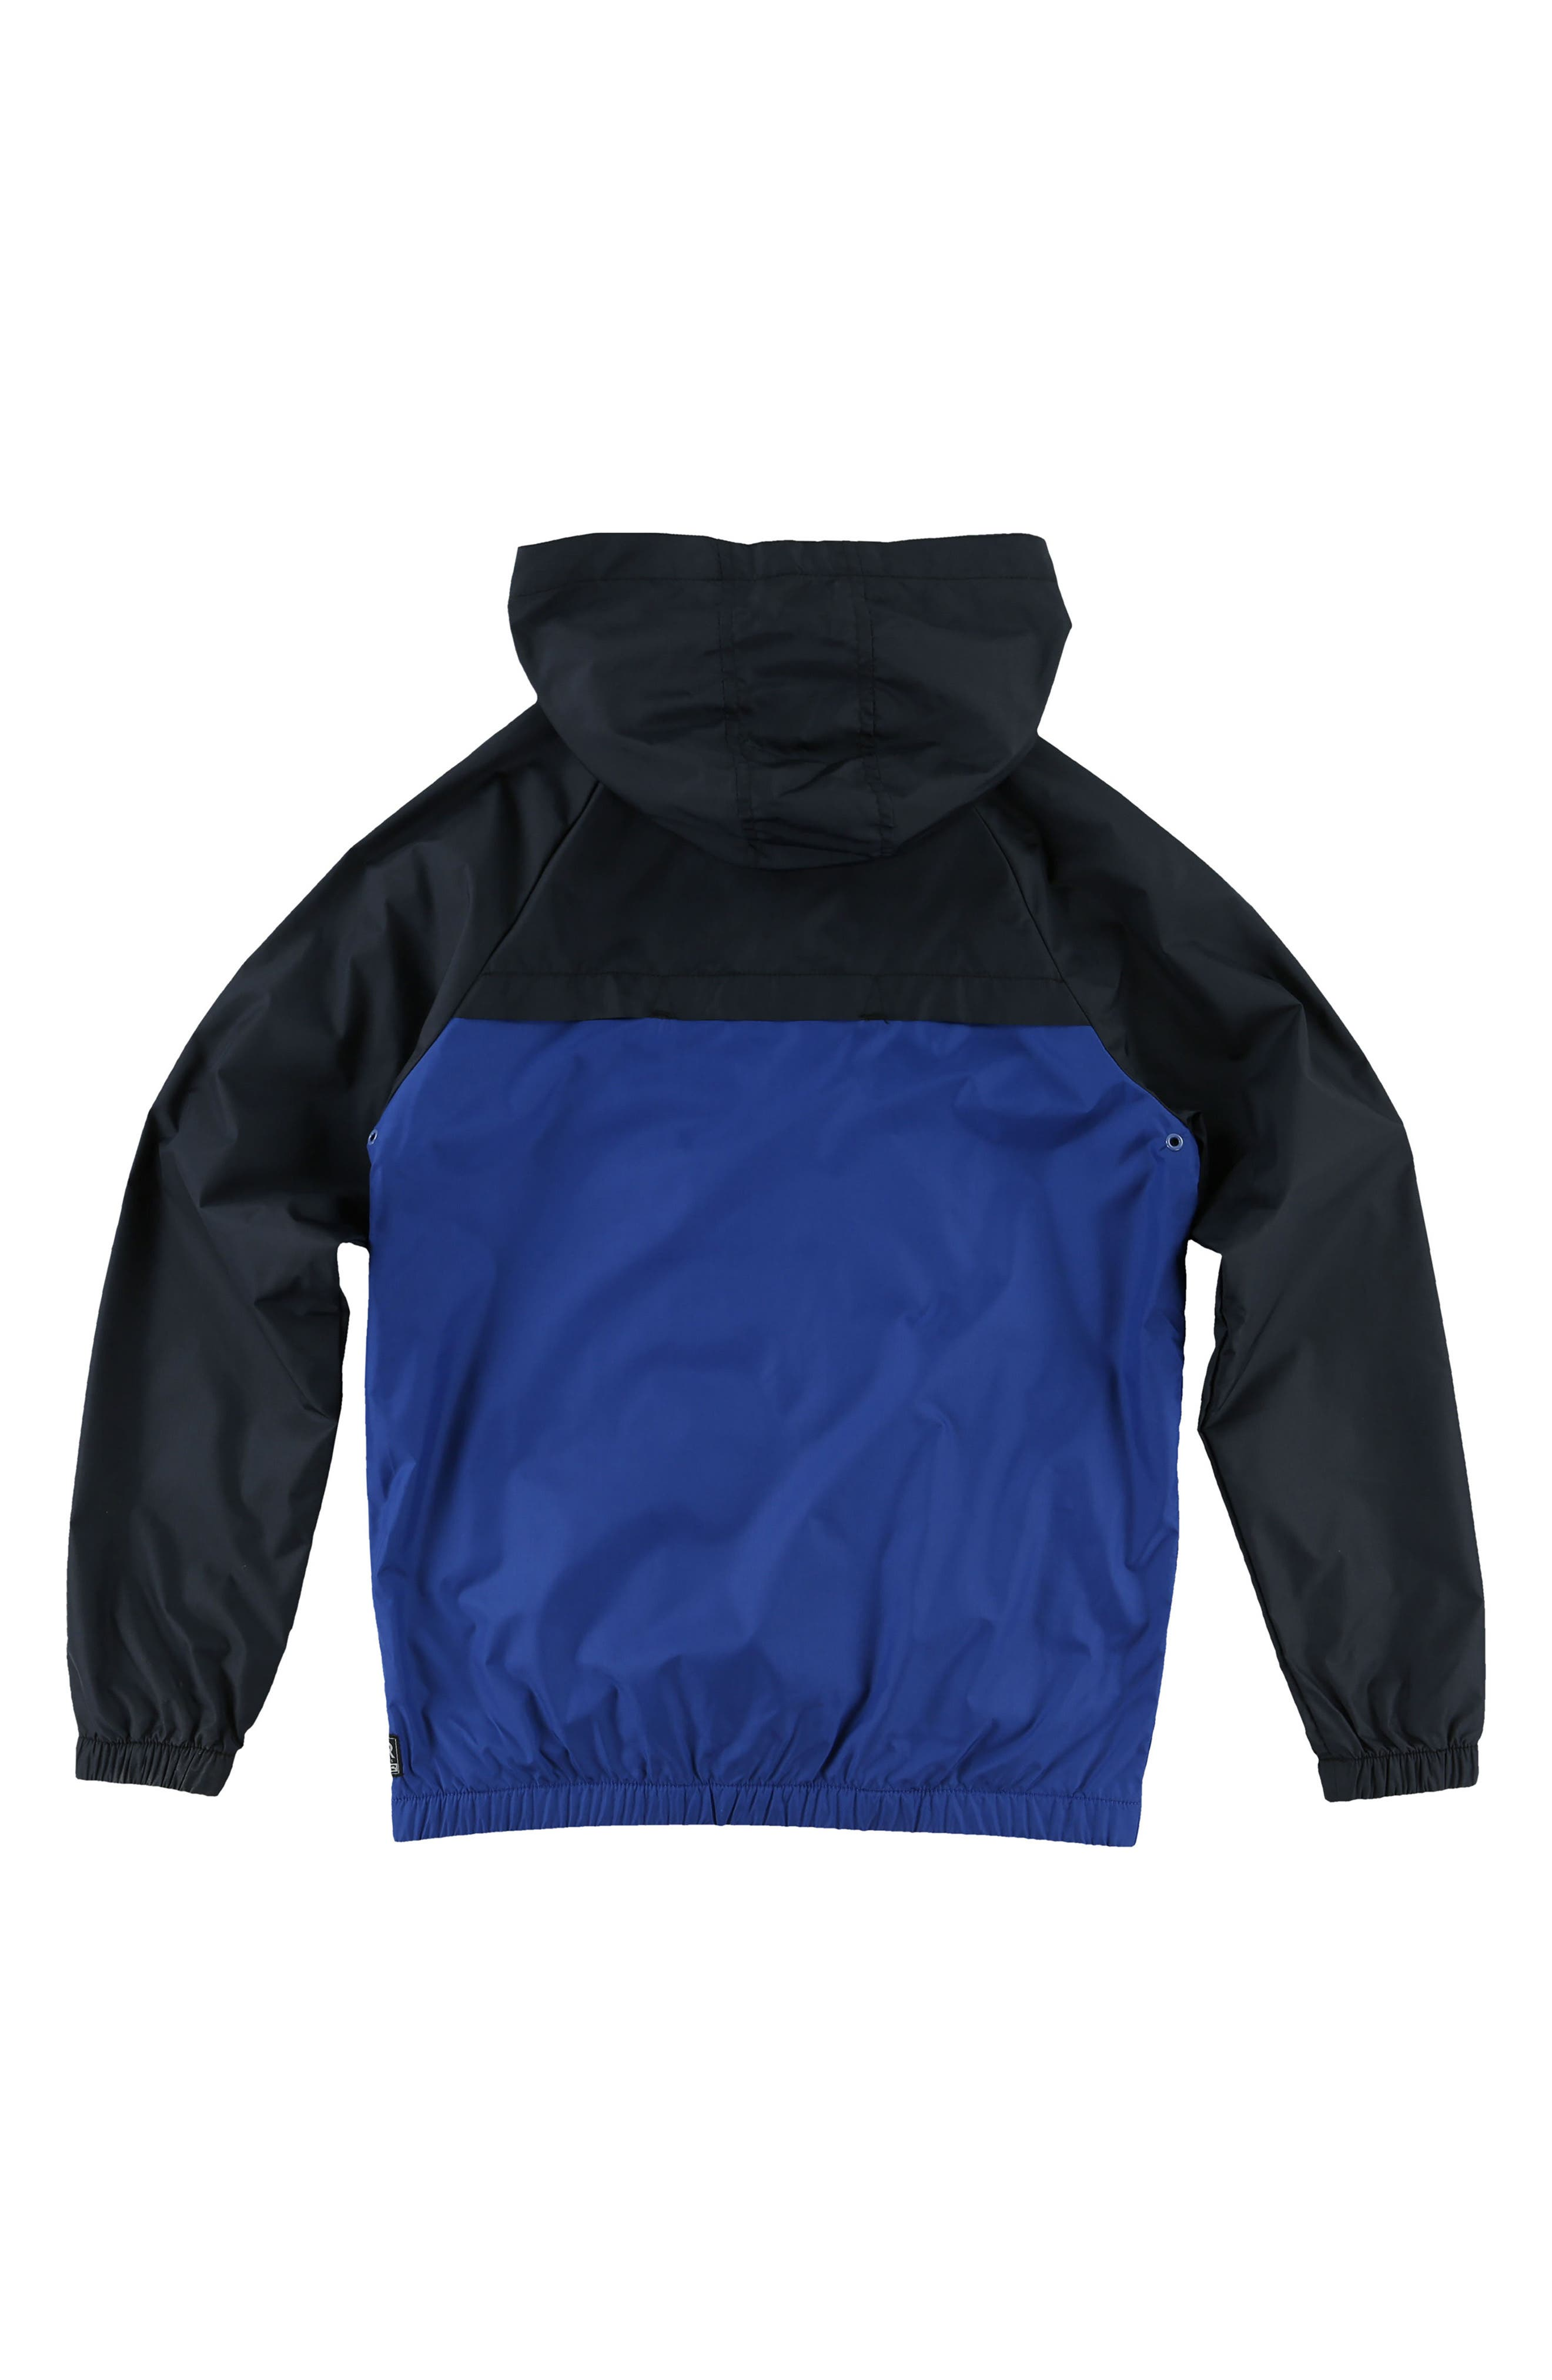 Traveler Packable Windbreaker Jacket,                             Alternate thumbnail 4, color,